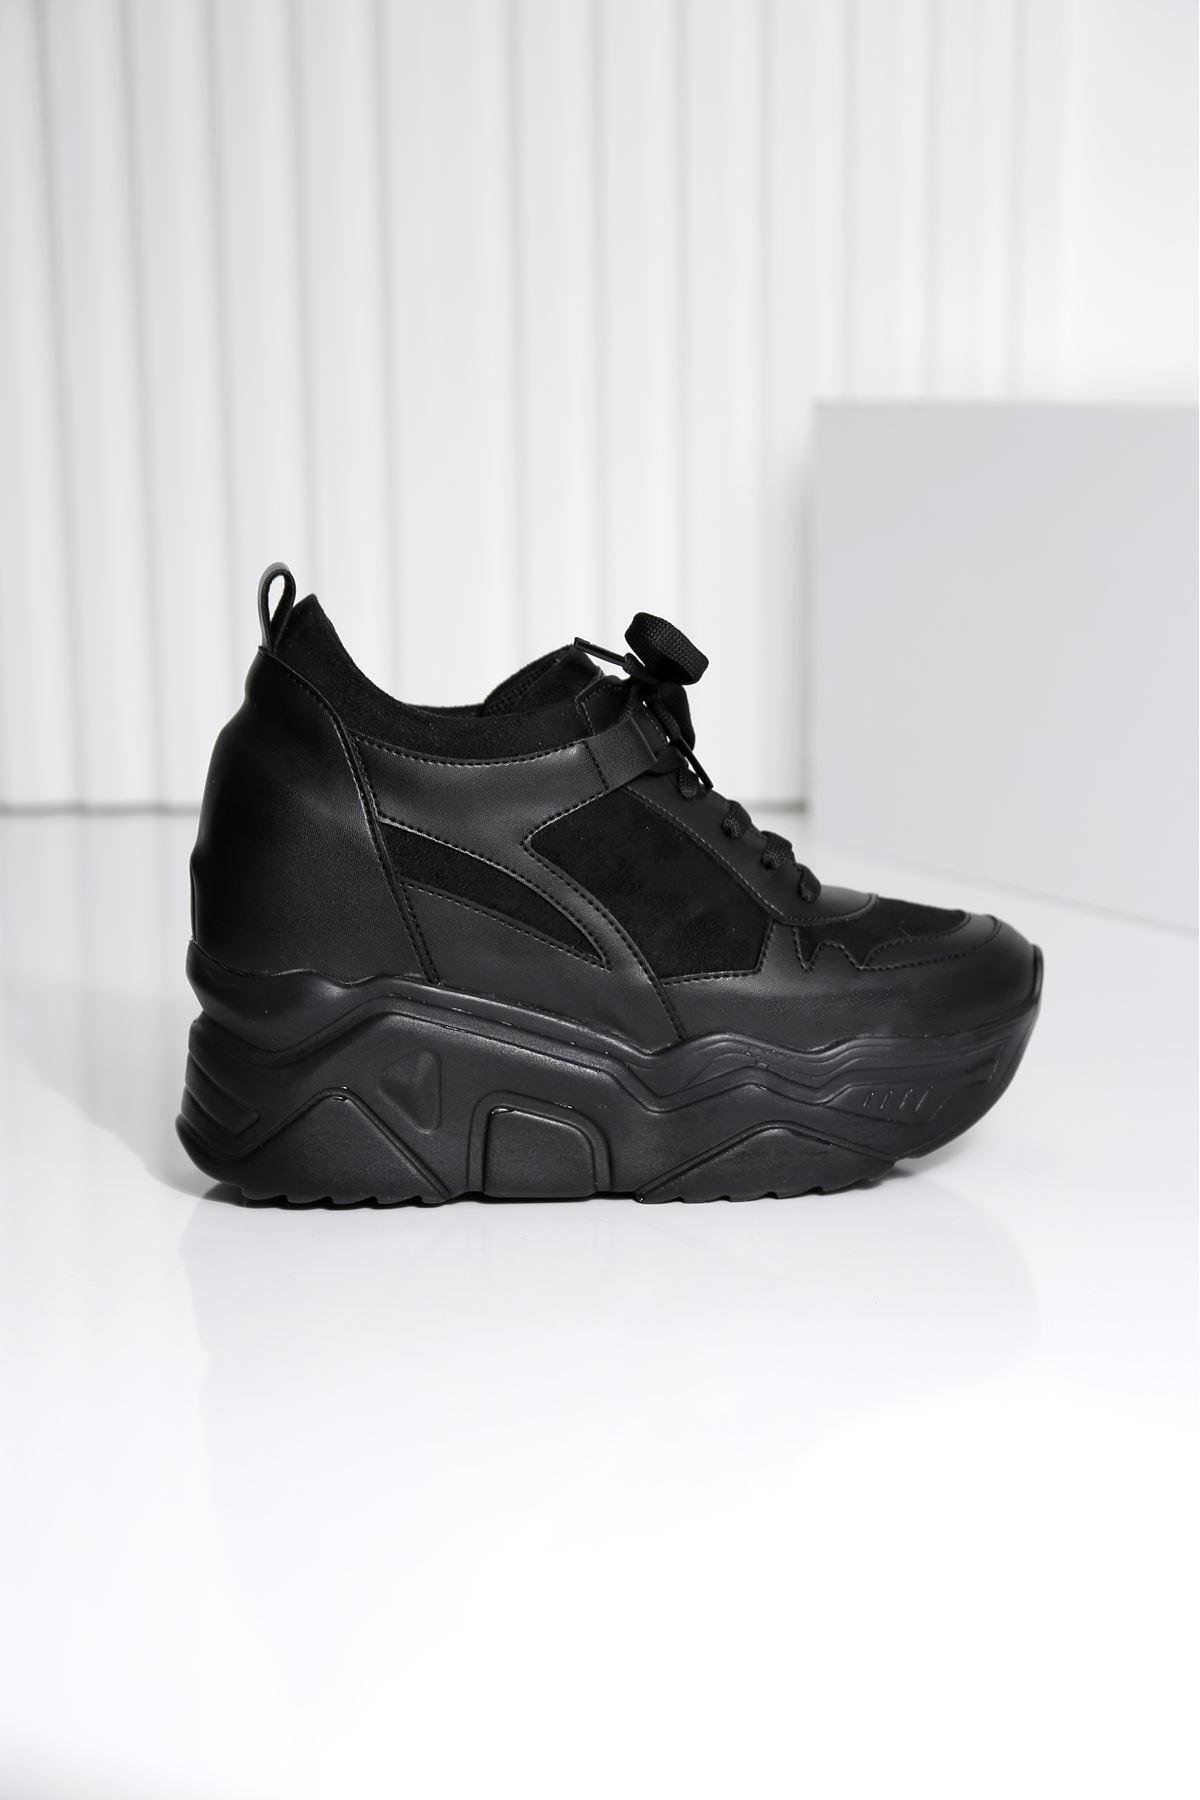 Showy Siyah Platform Spor Ayakkabı